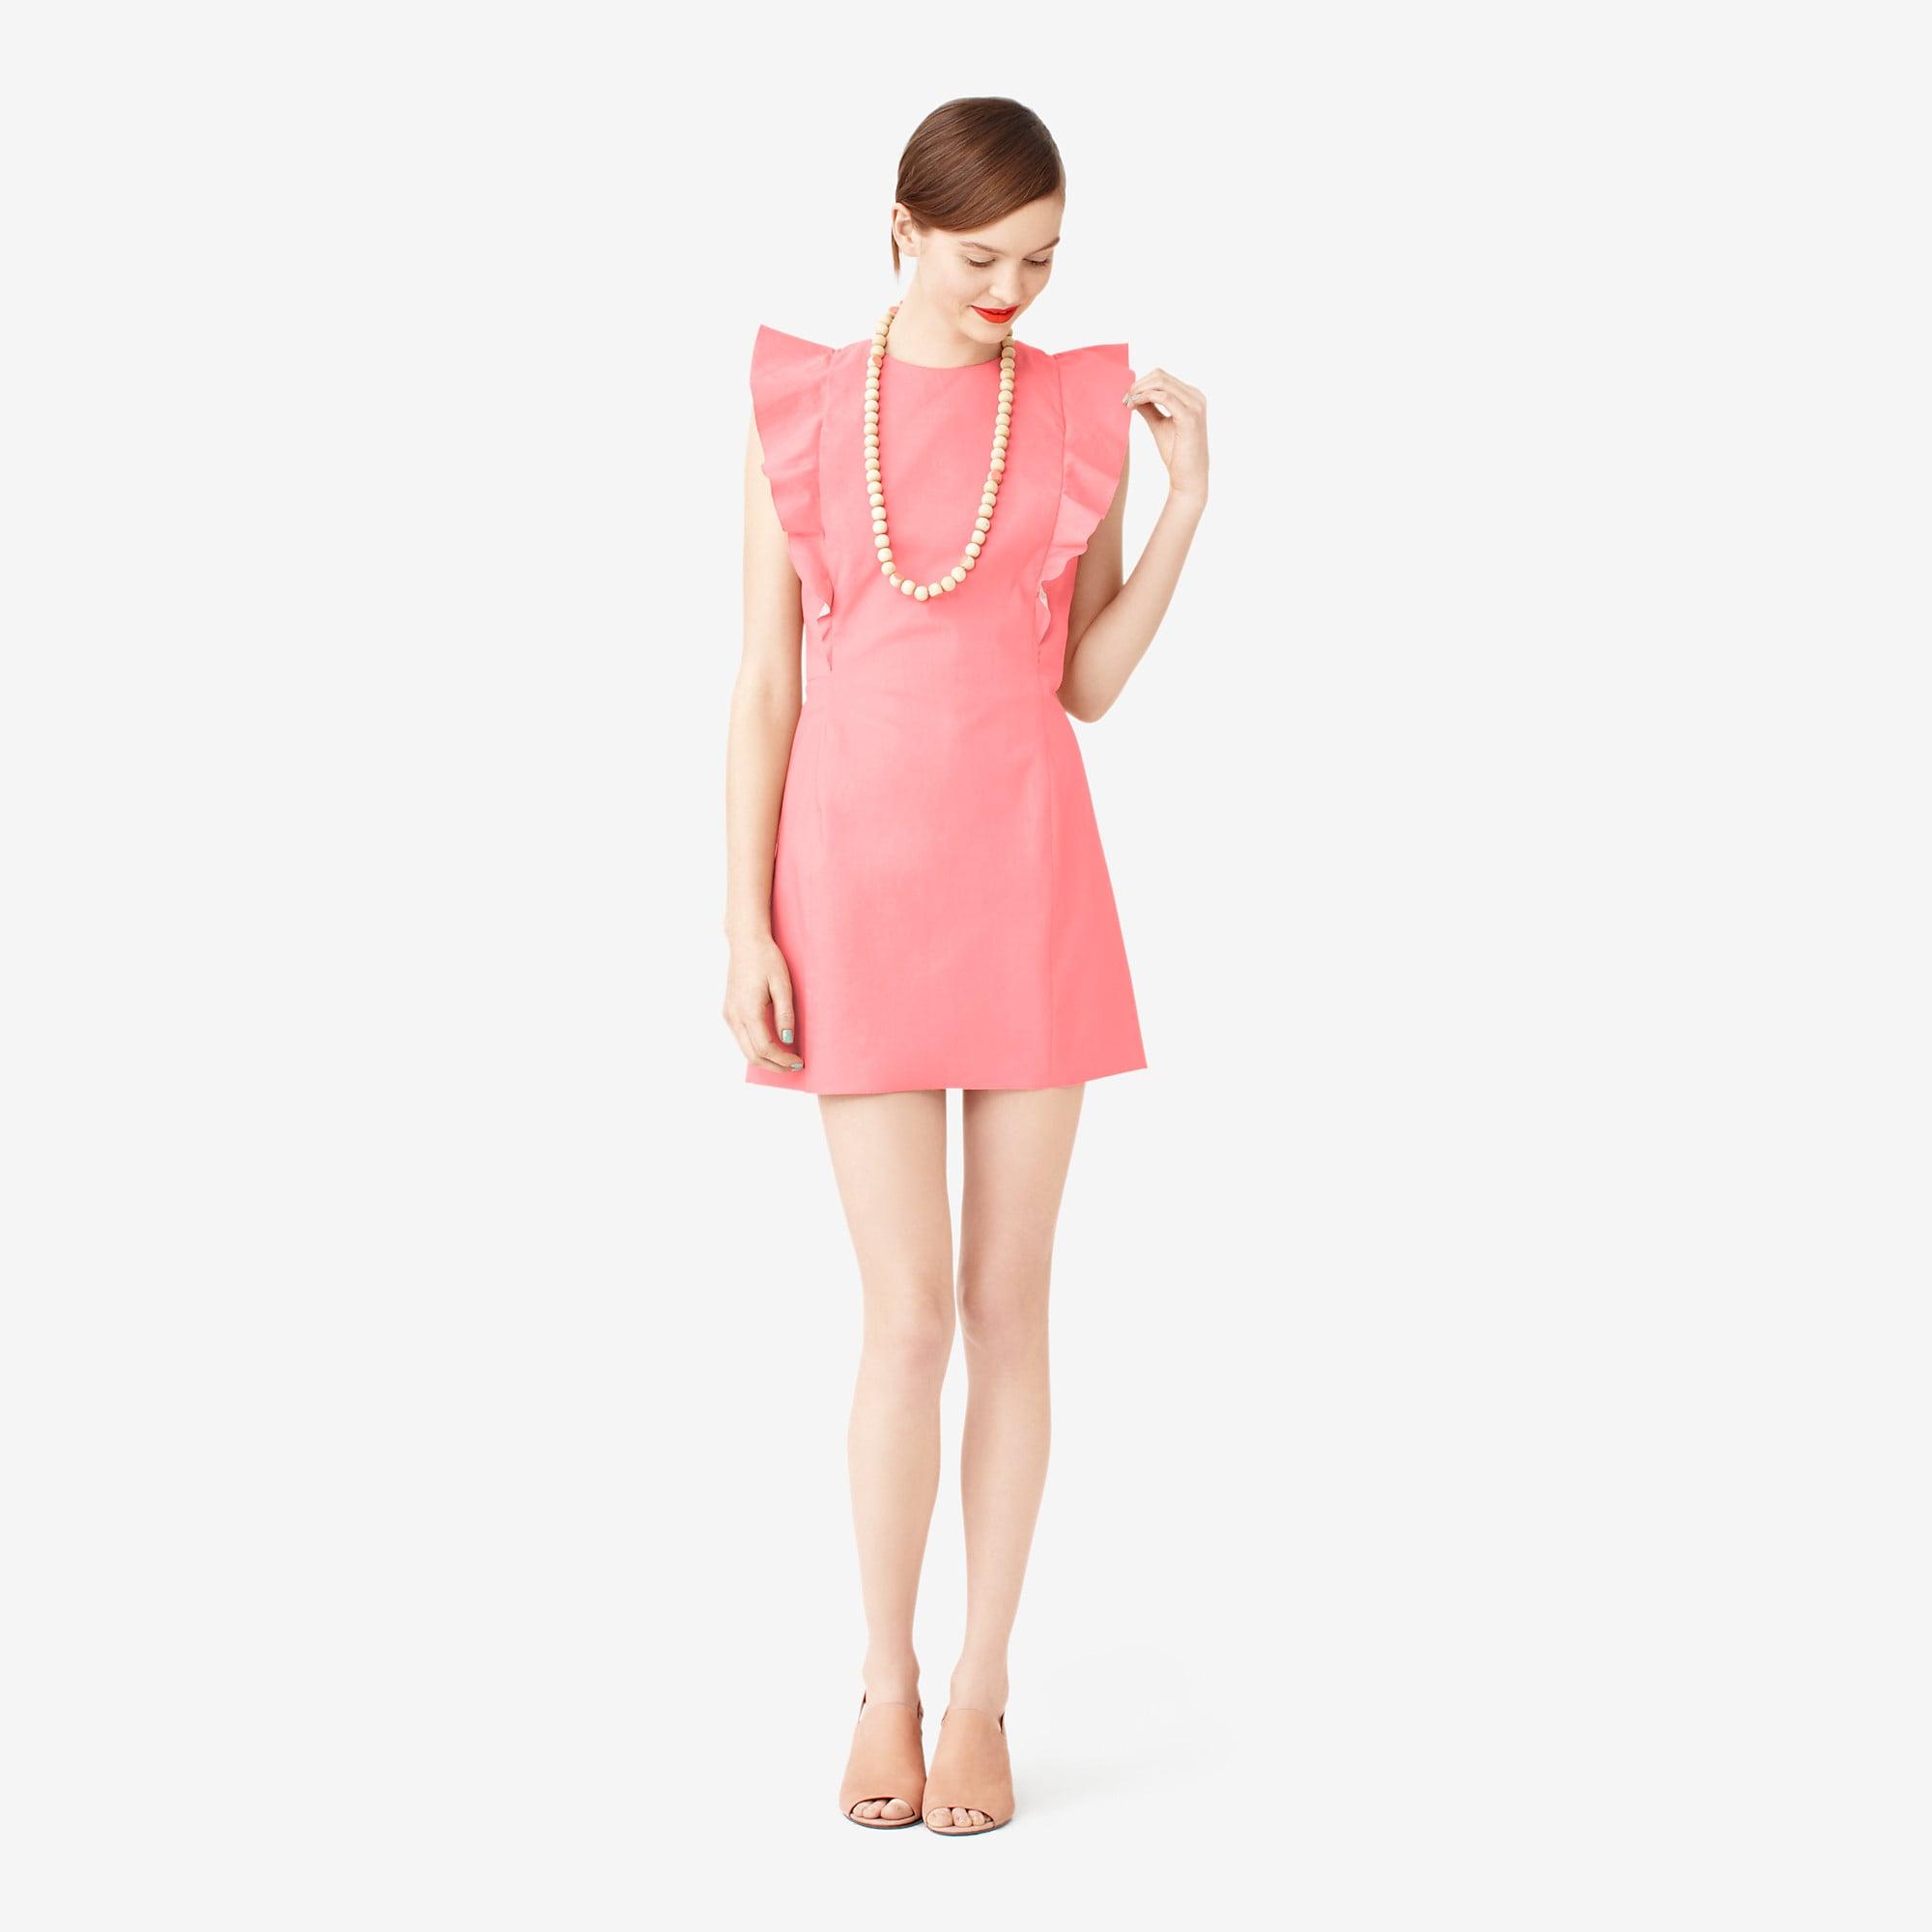 Kate Spade Saturday pink ruffle-sleeve dress ($170)